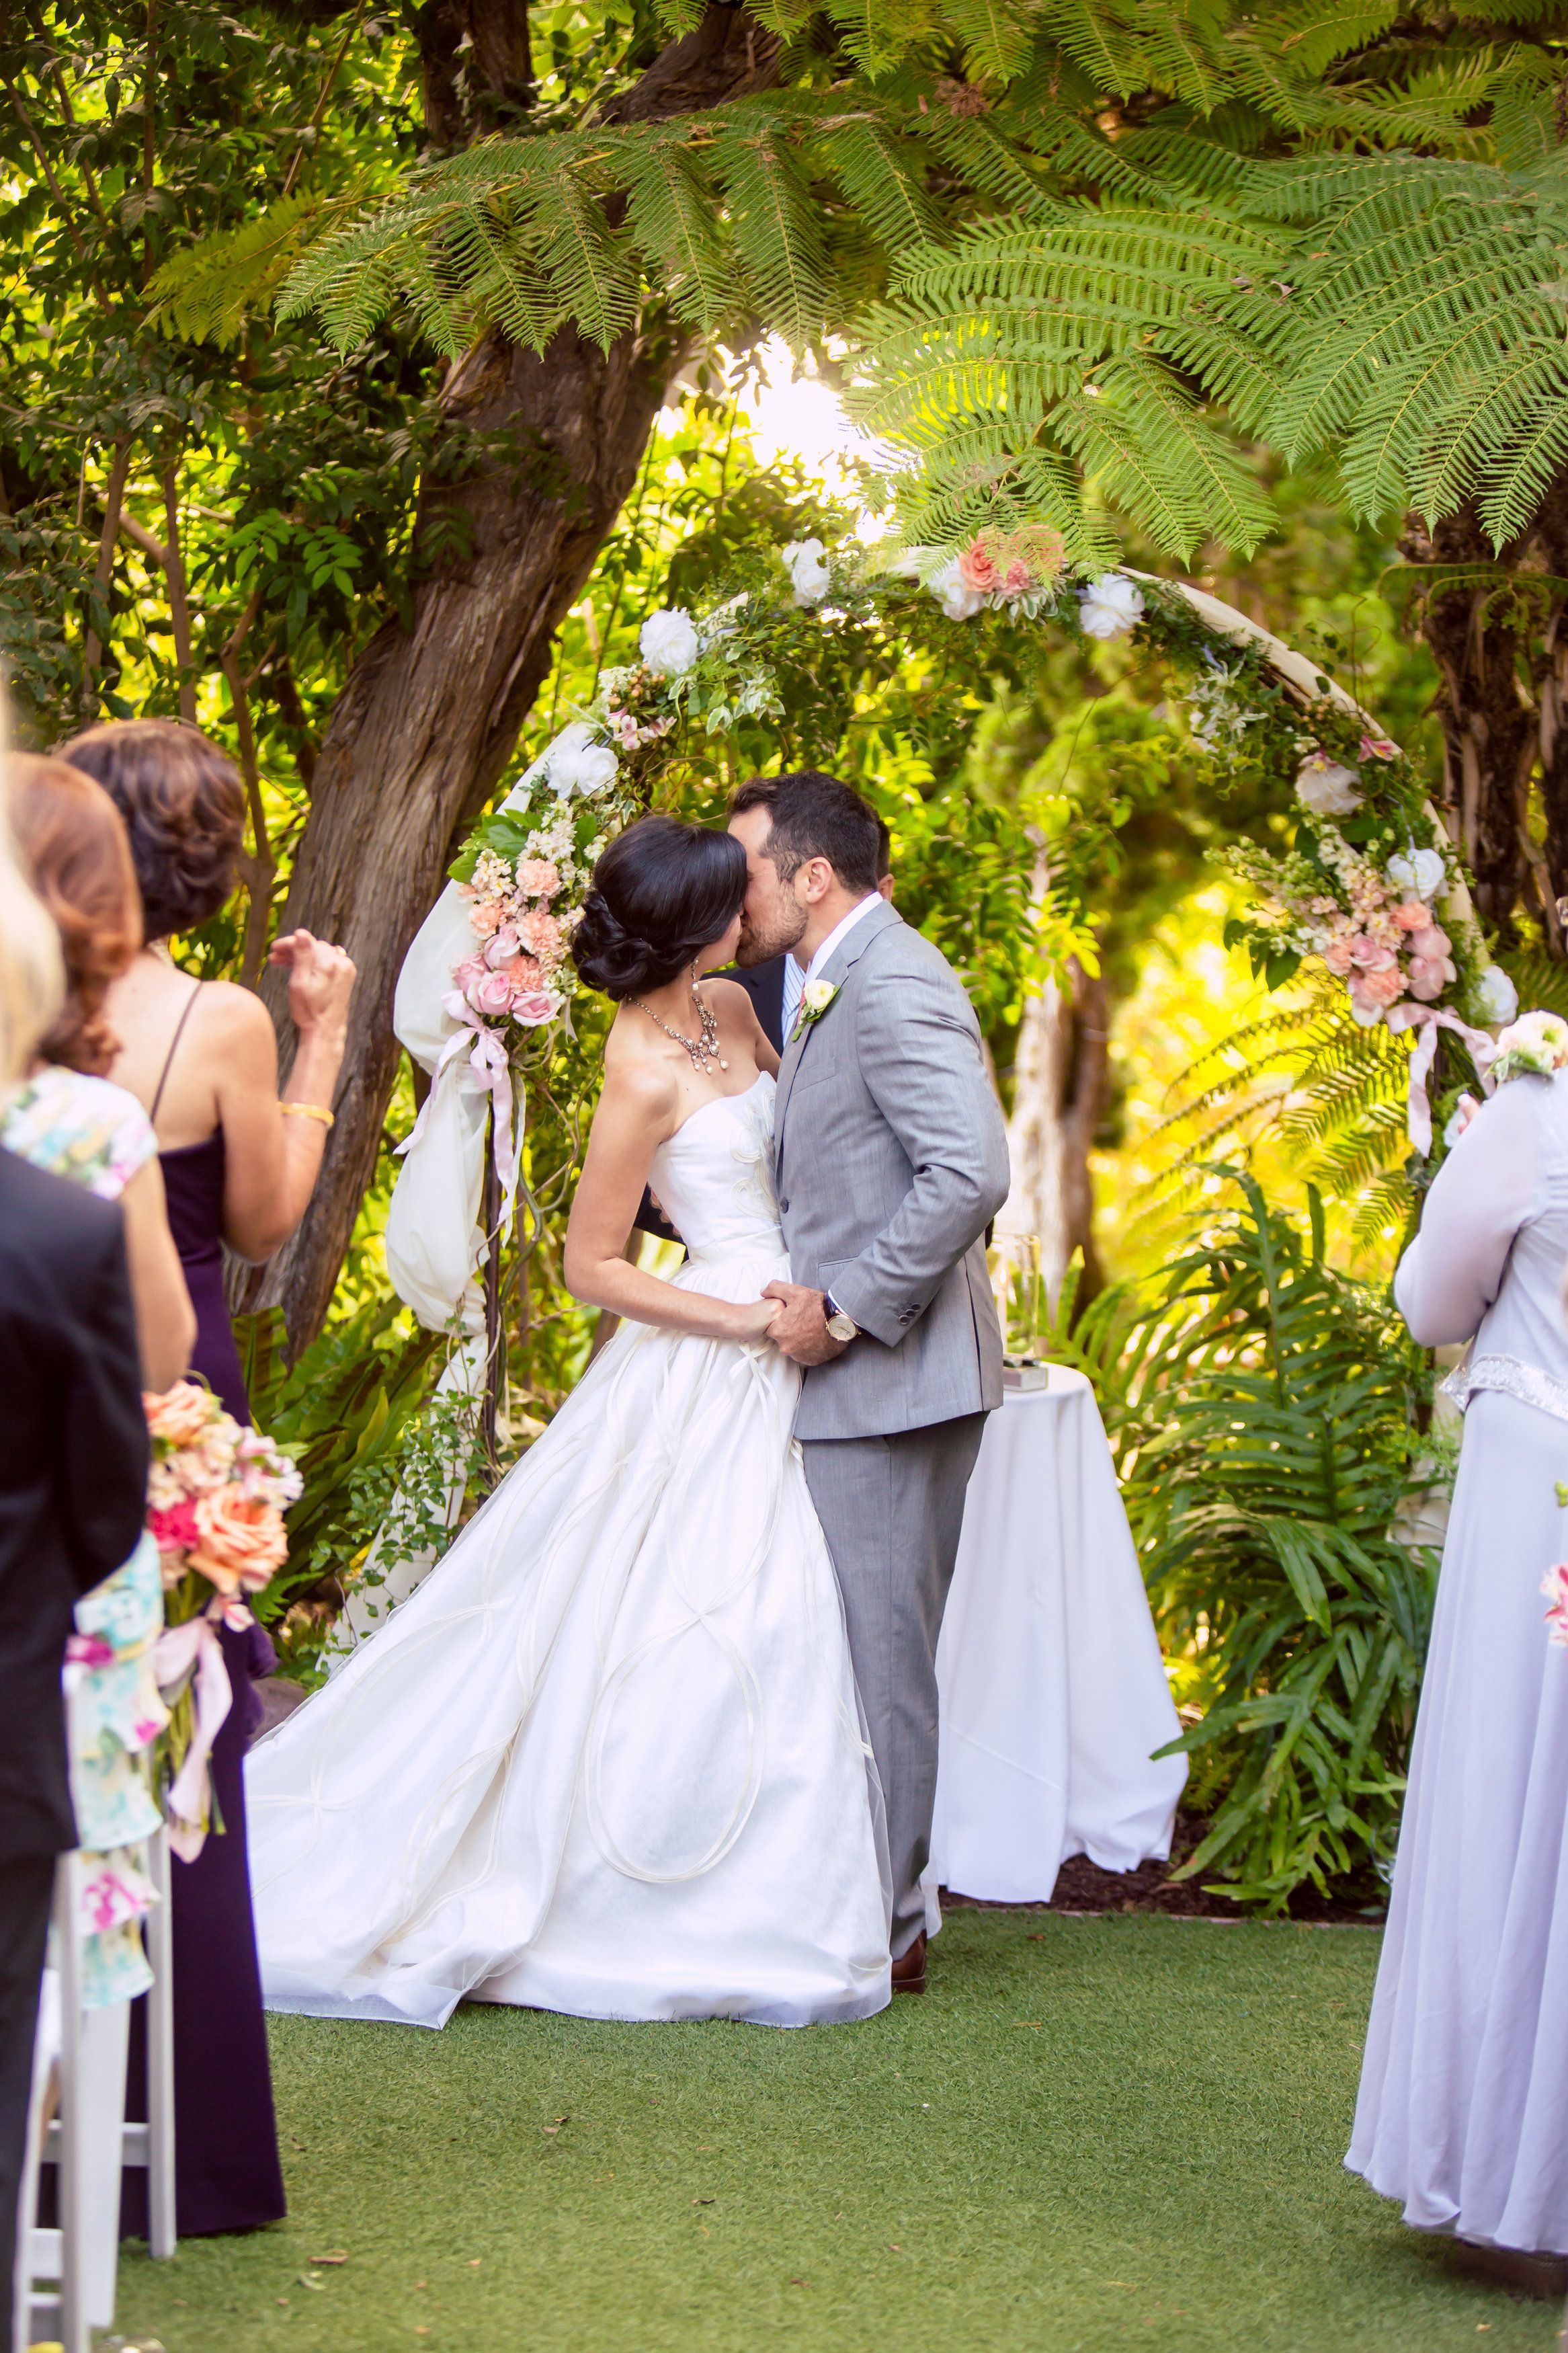 The #overthemoon #inlove #couple #kisses as #husbandandwife! ::Shwan + Dina's stunning botanic garden wedding in San Diego, California:: @san pan Diego Botanic Garden #SanDiegoWeddings #GorgeousVenue #WeddingVenues #outdoorwedding #ceremony #marriagekiss #weddingphotography